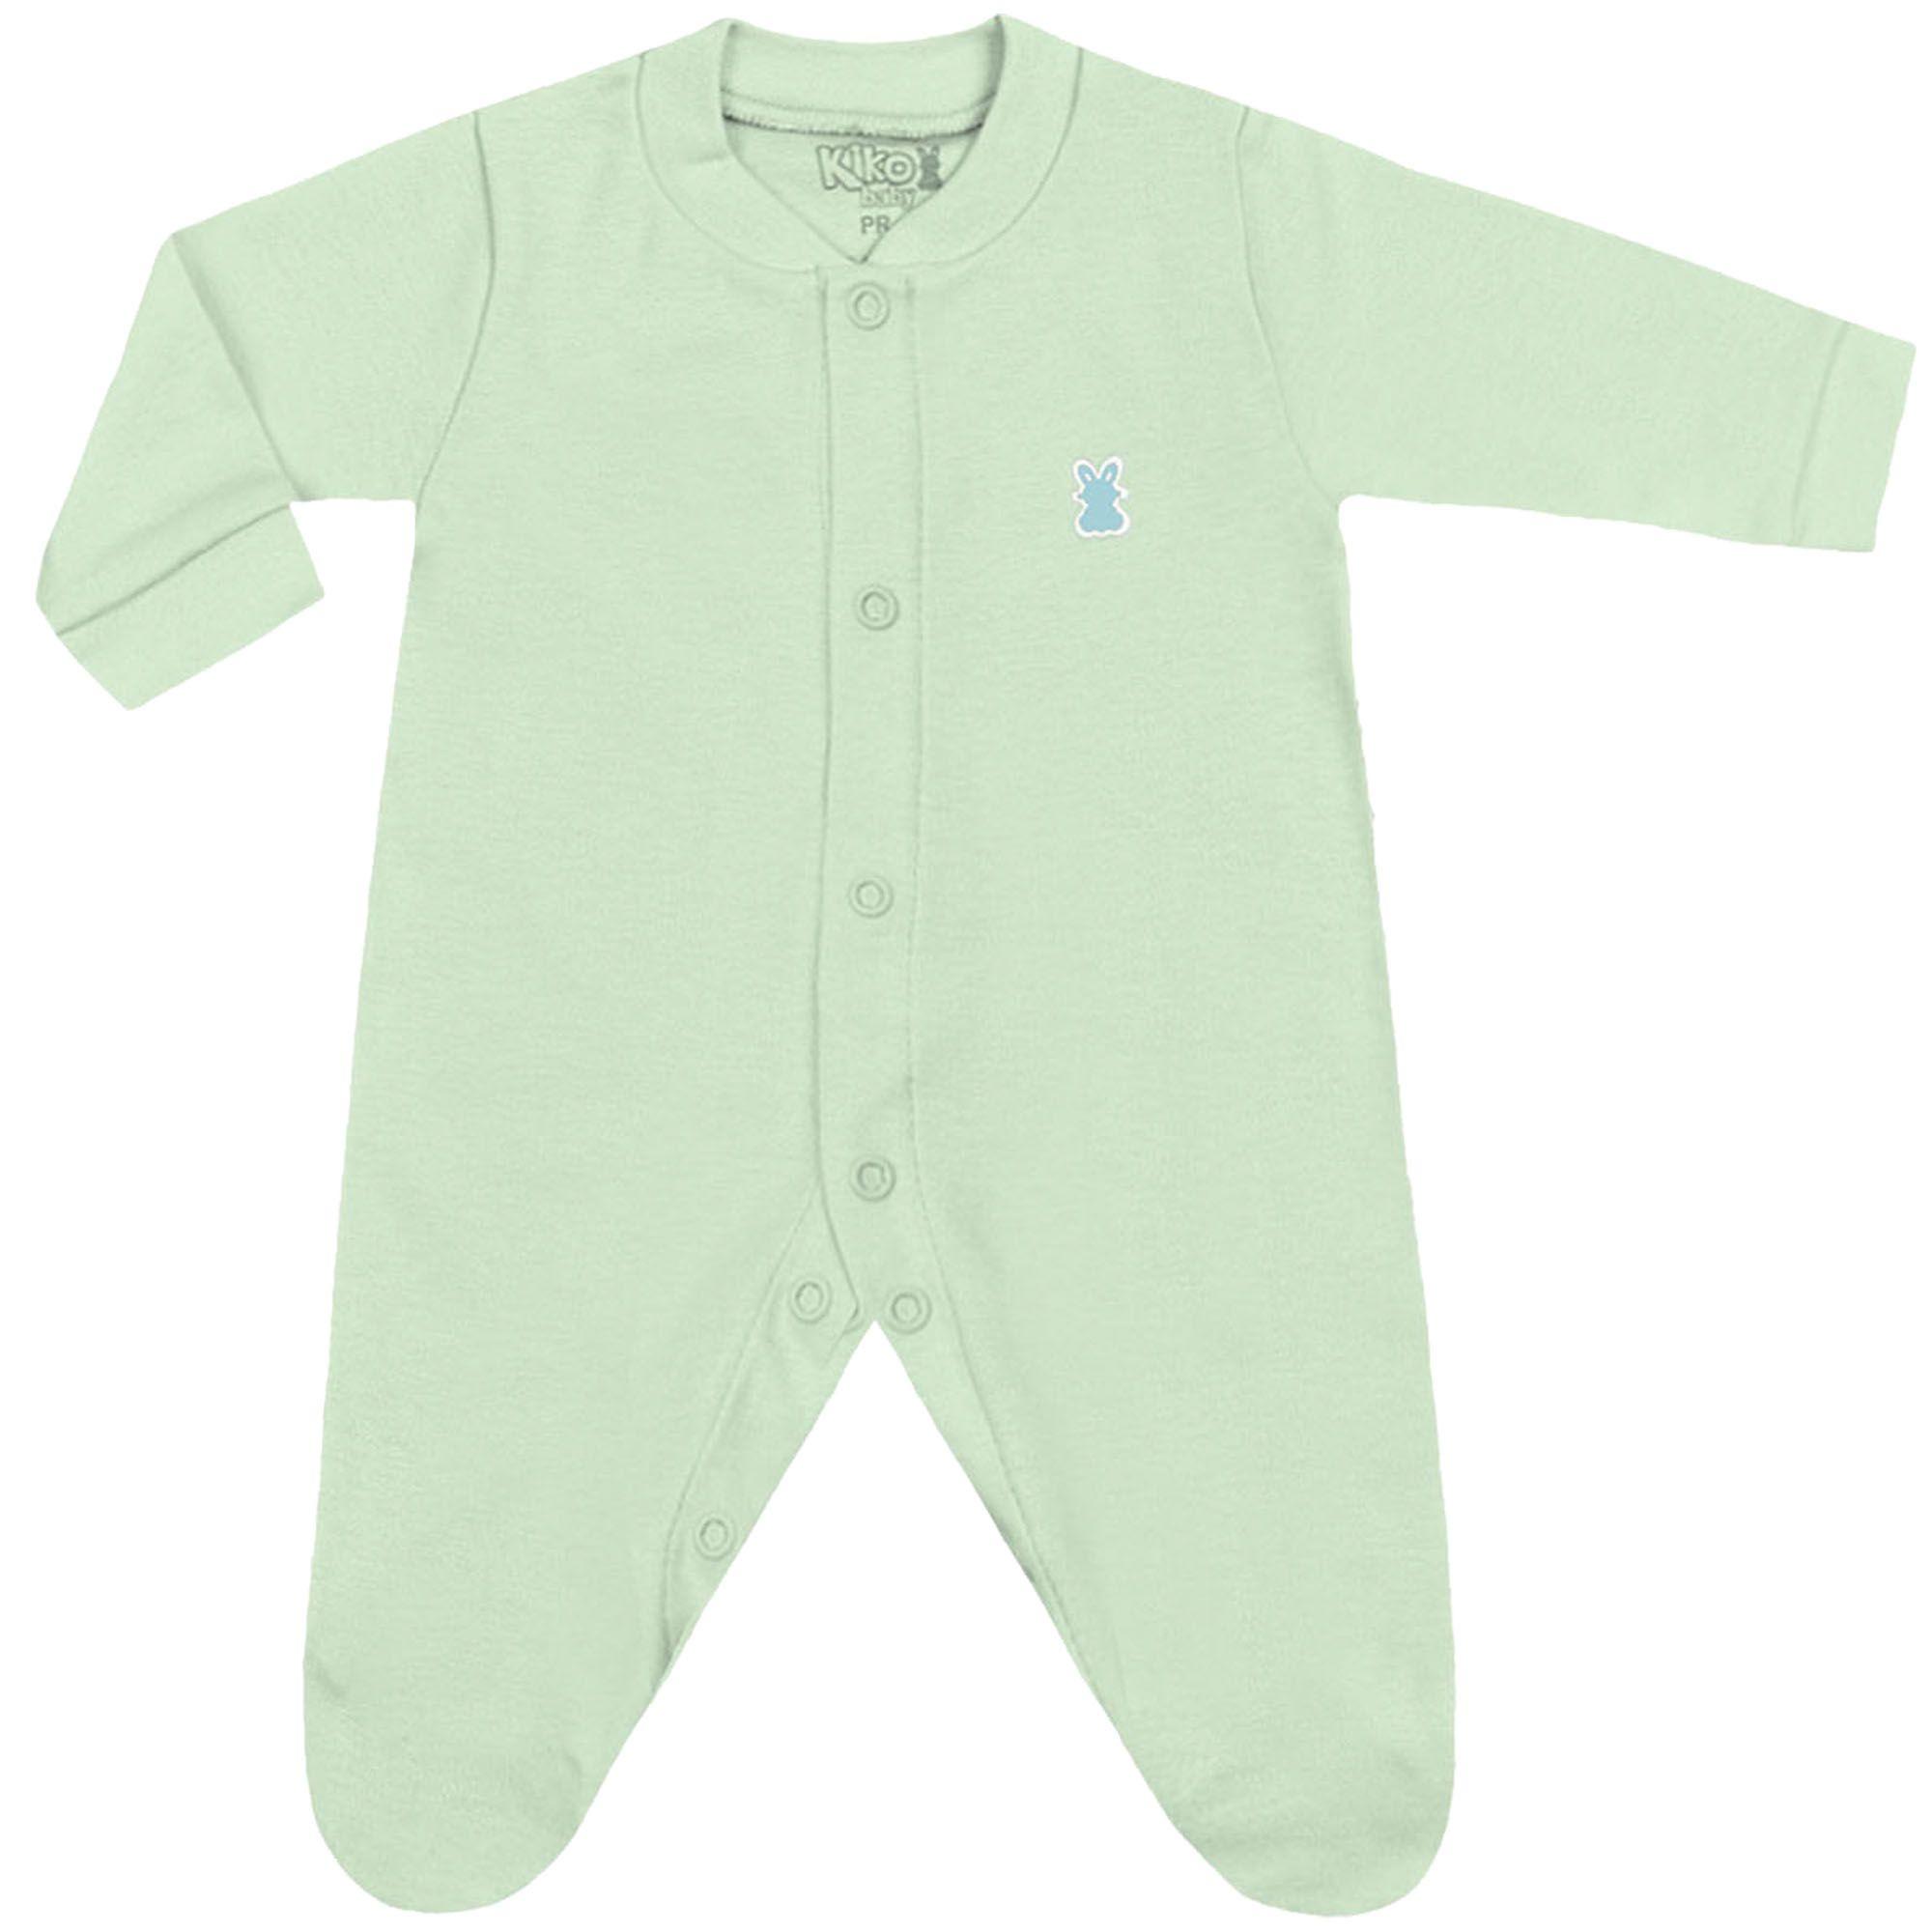 Macacão Suedine Kiko Baby Color Liso - Prematuro